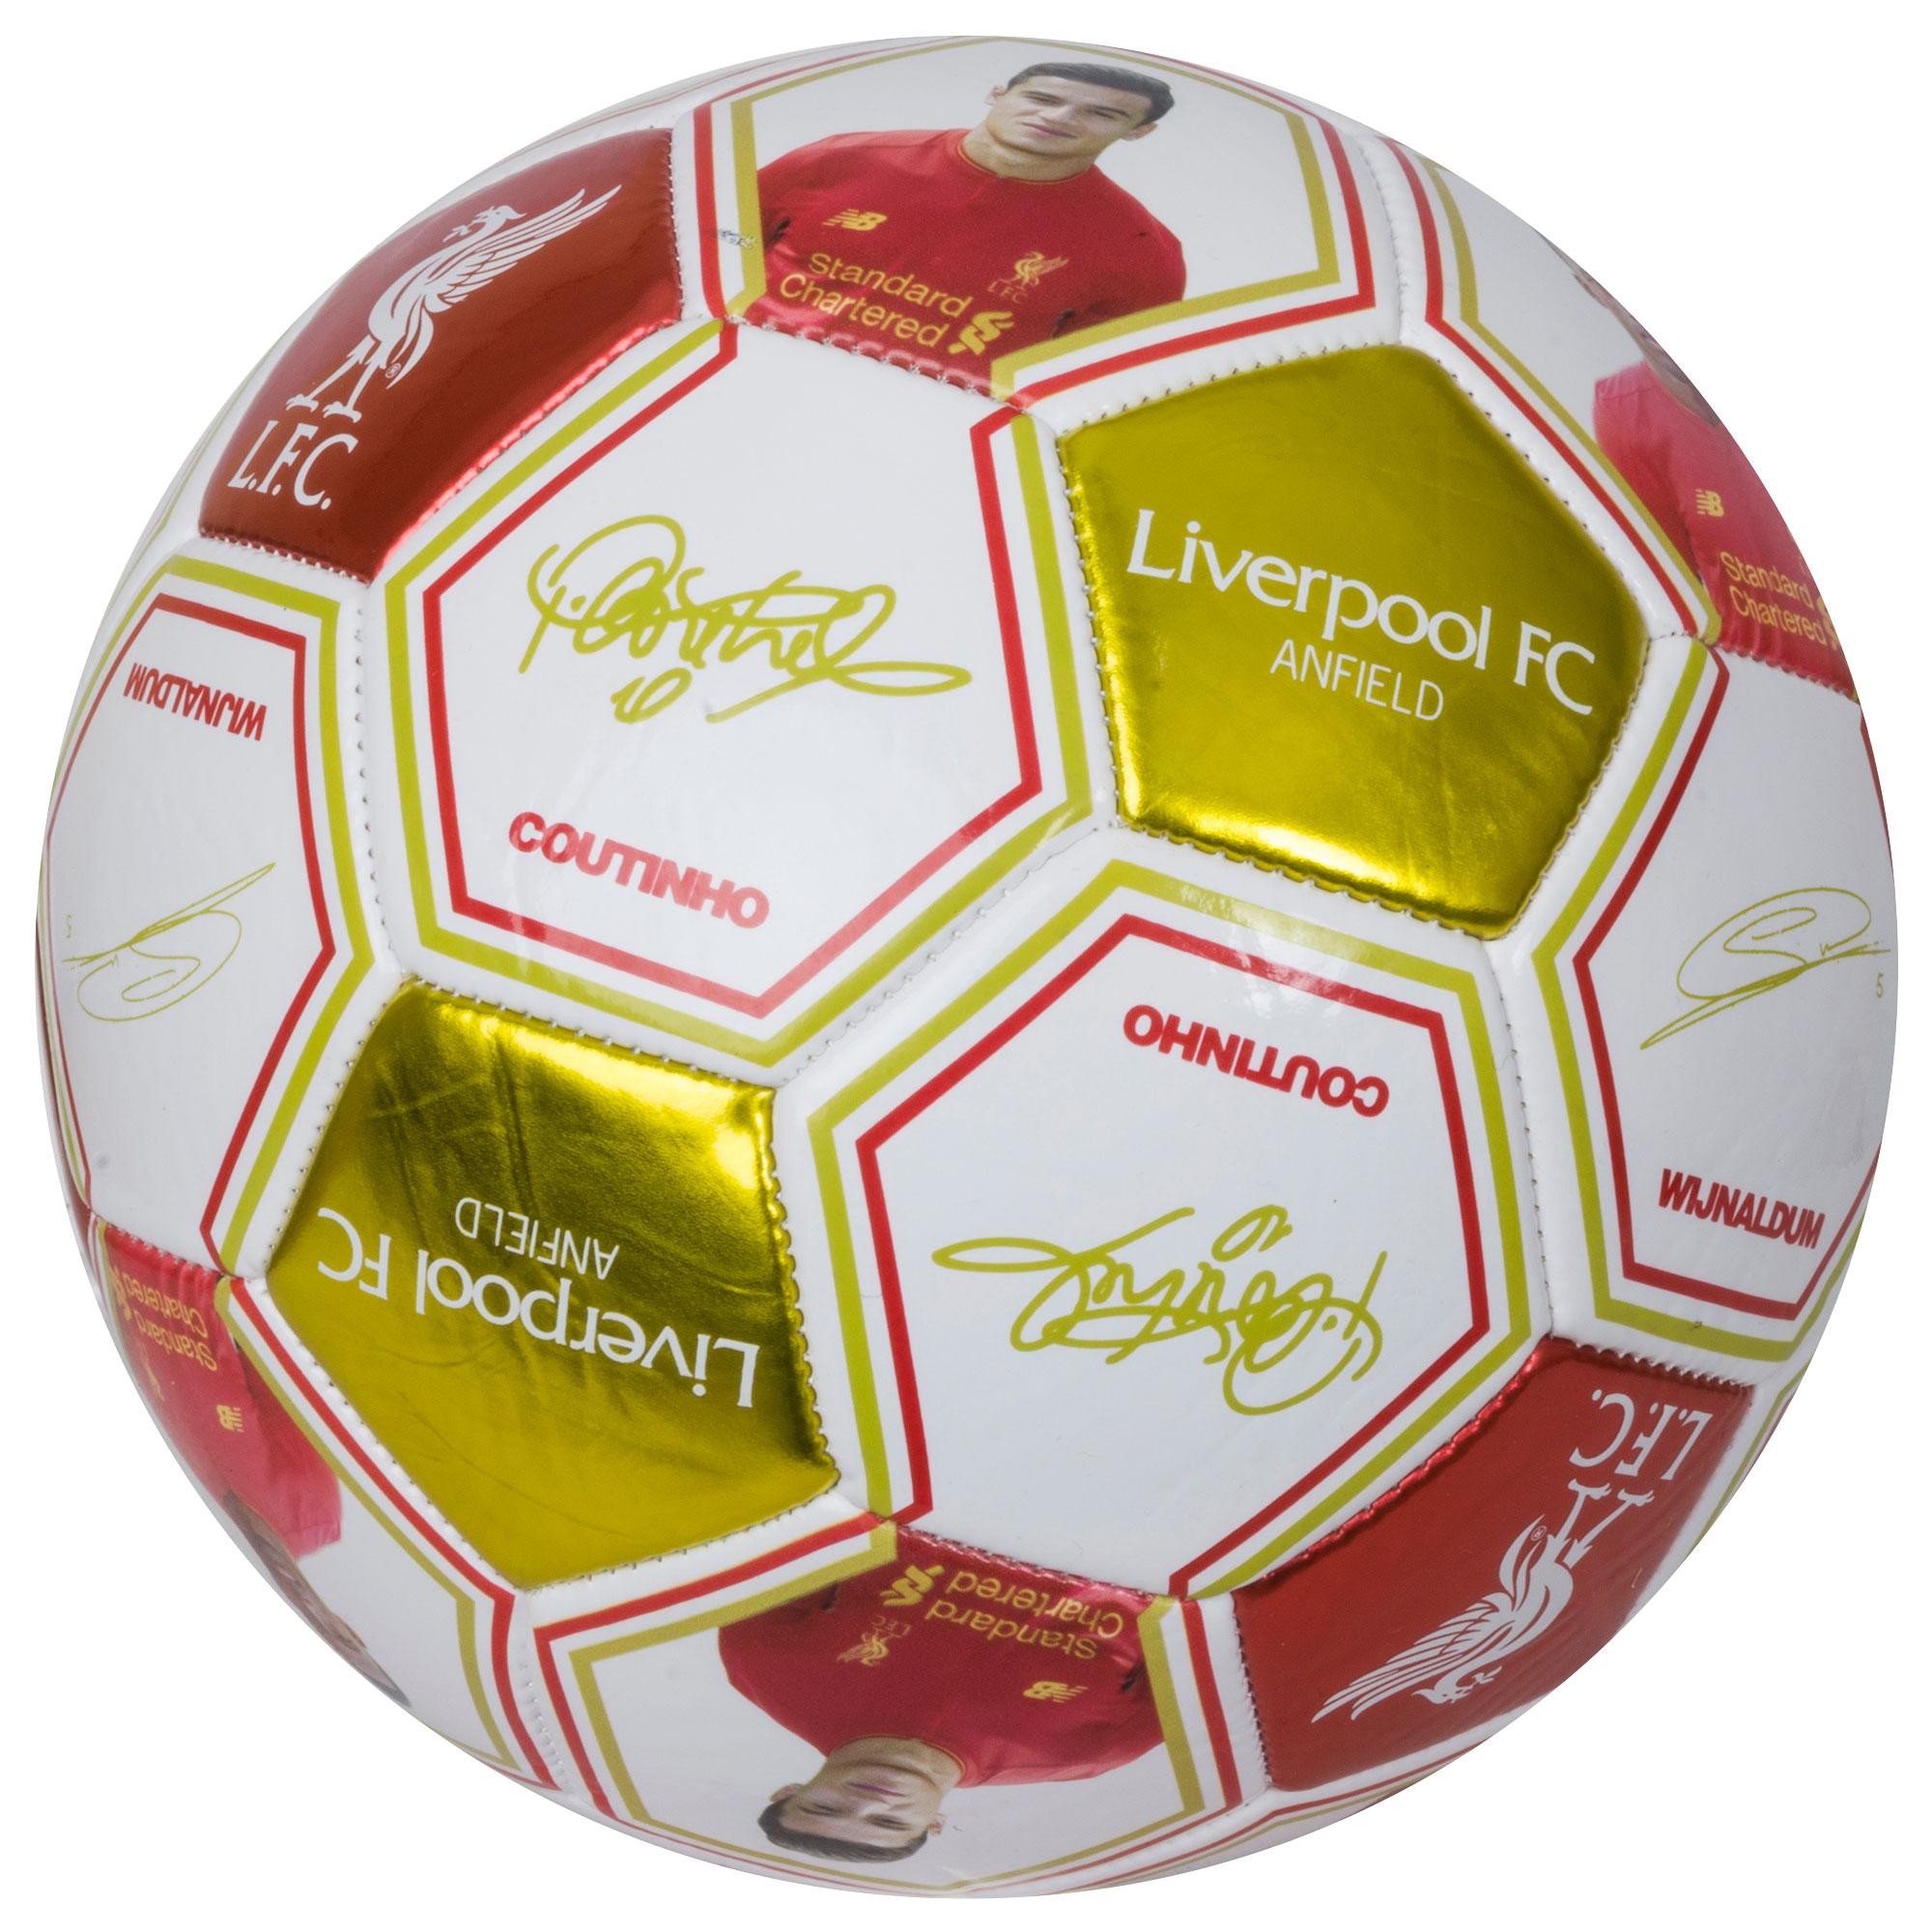 Liverpool Photo Signature Ball - OS